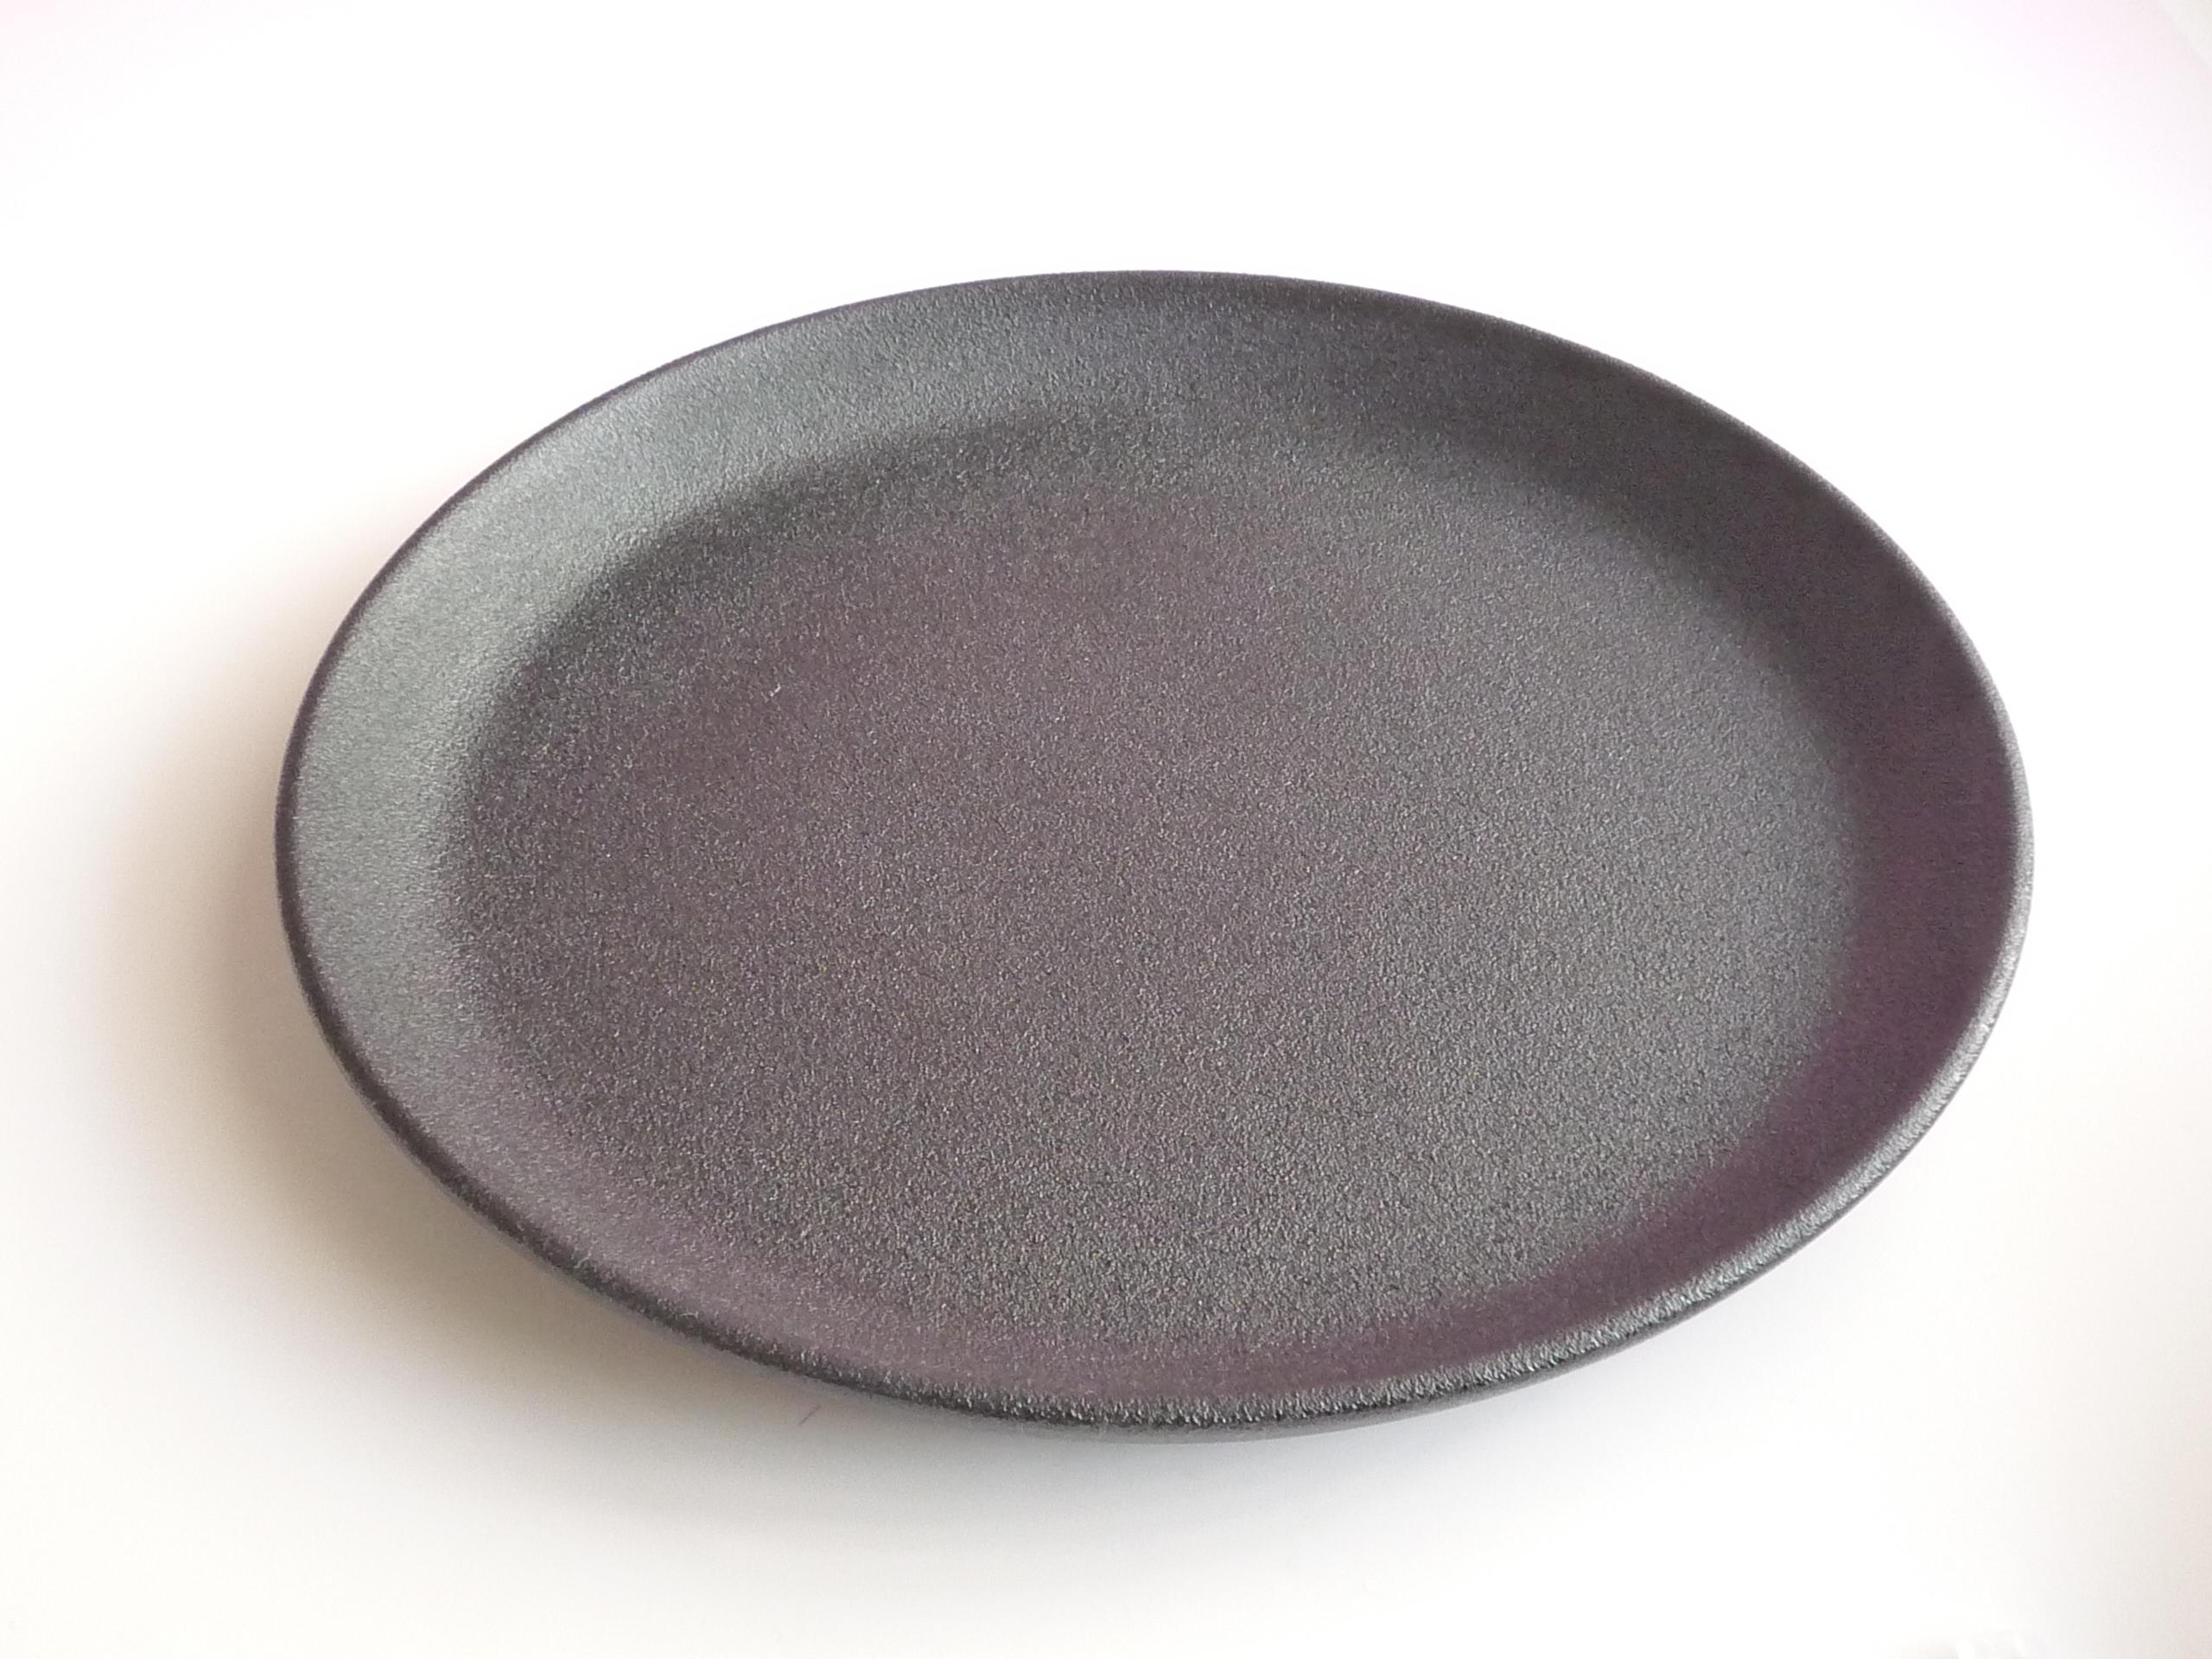 輪島漆塗り 丸皿蒔地(黒)8寸 約24cm